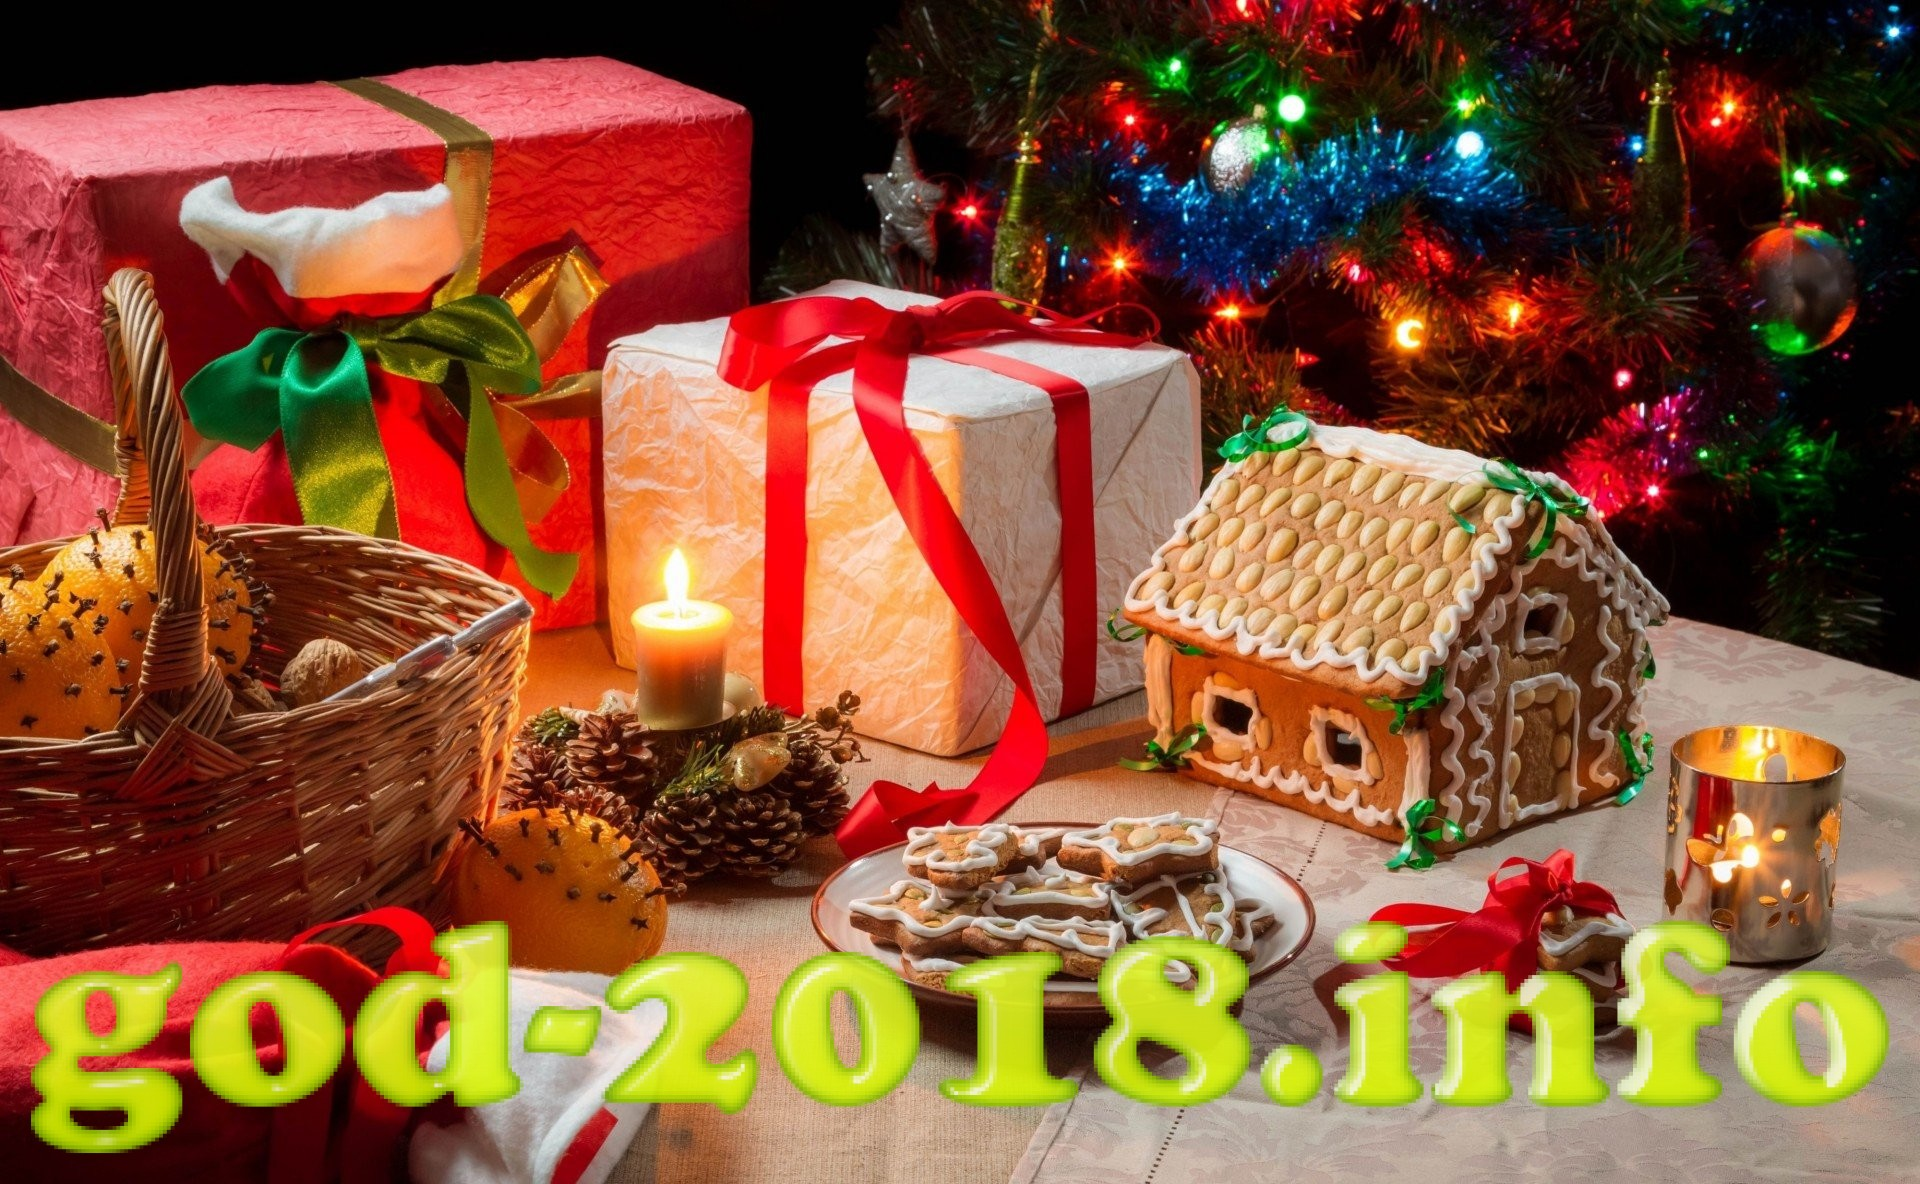 interesnye-pozdravlenija-s-novym-godom-2018-dlja-druzej-3